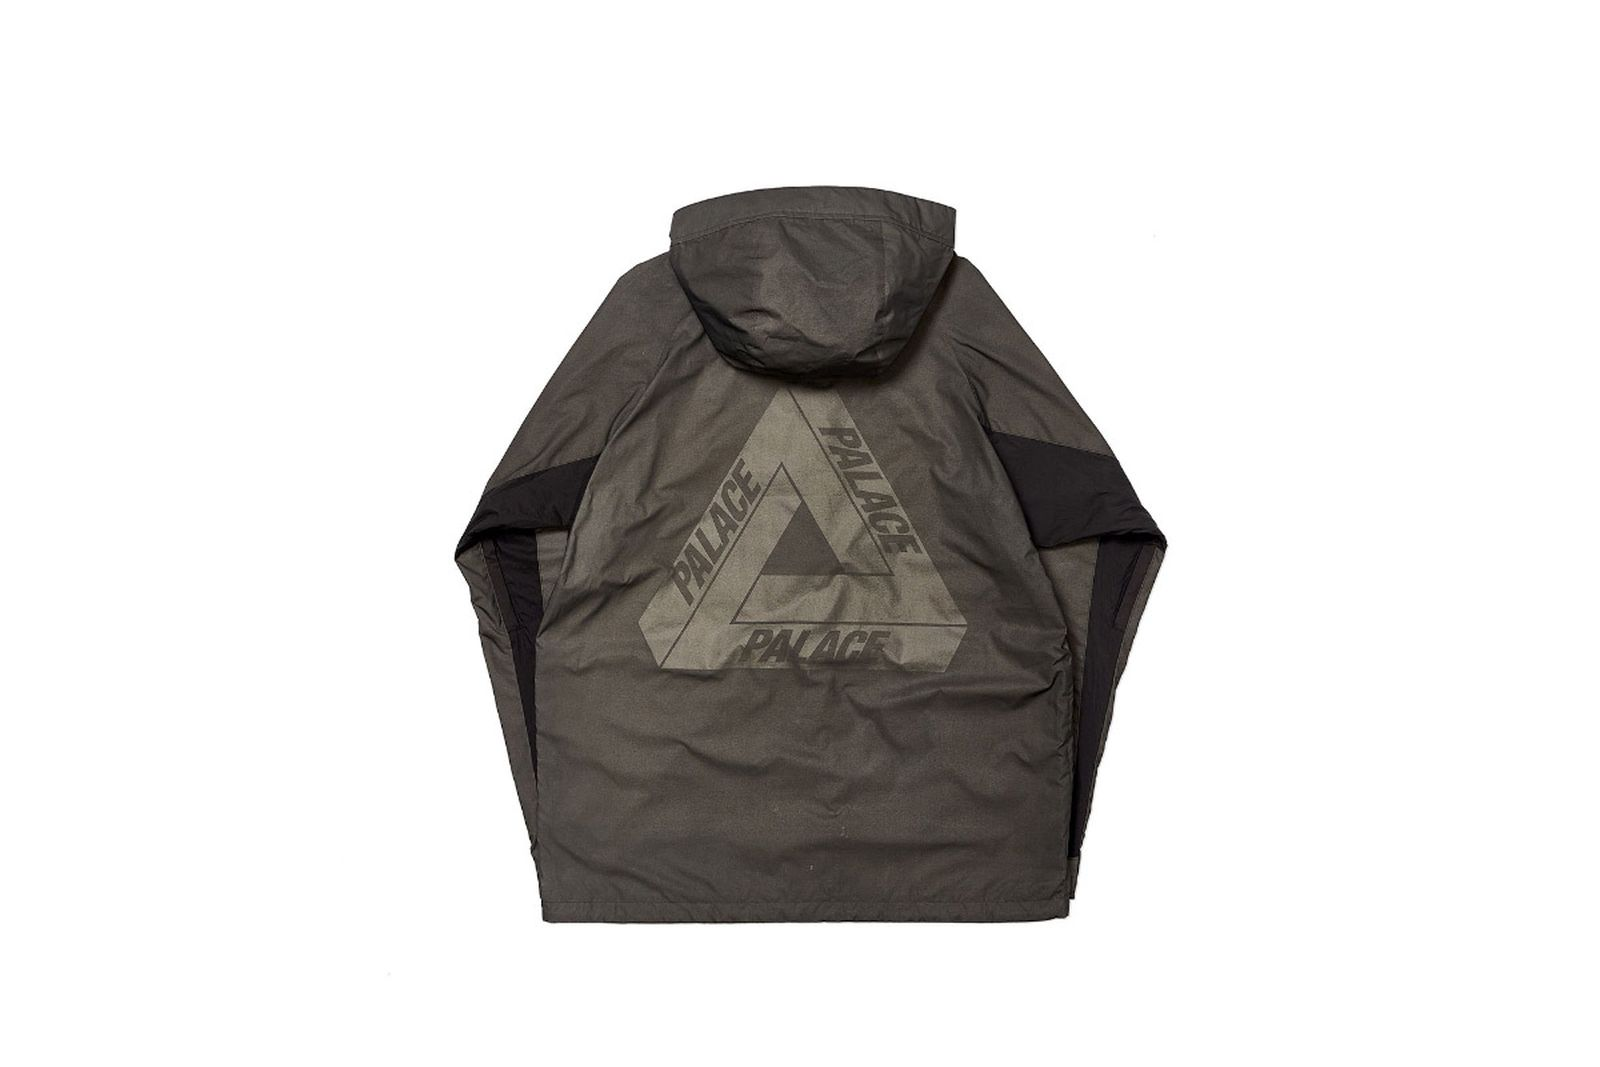 Palace 2019 Autumn Jacket Deflector grey back fw19